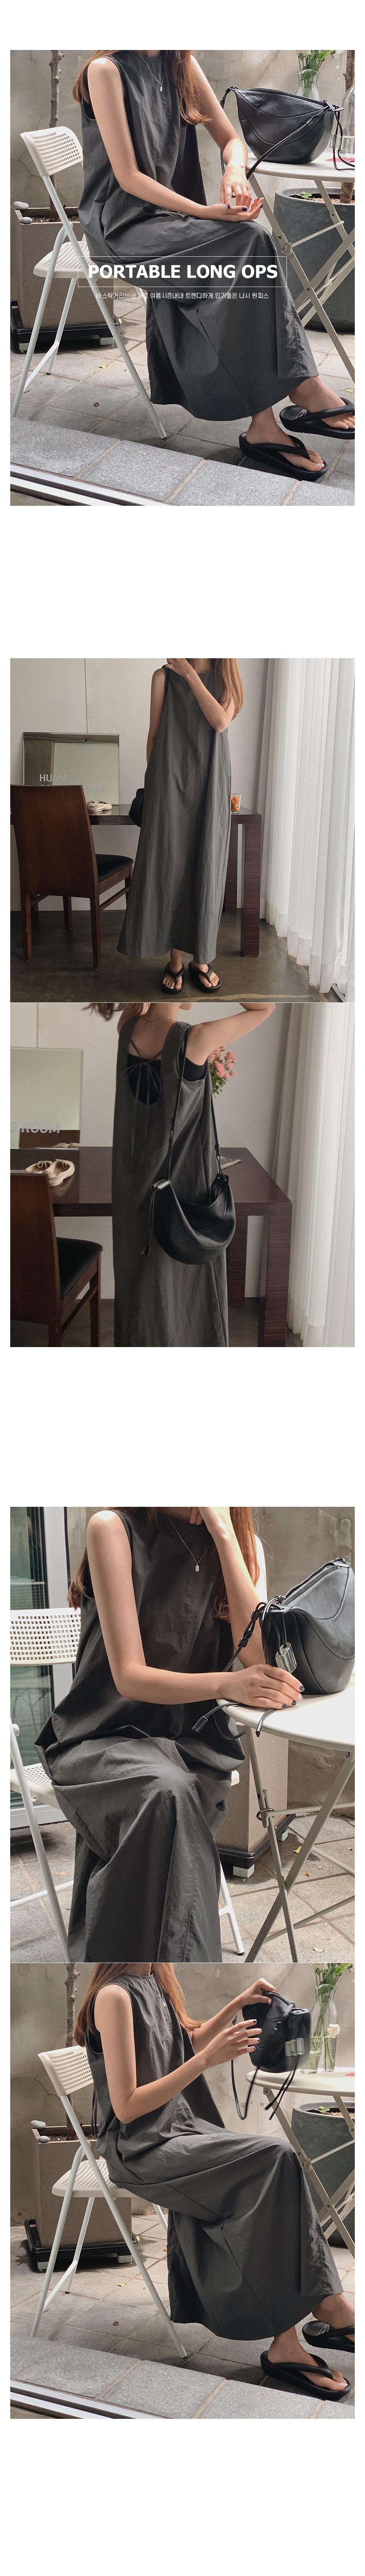 Portable long dress